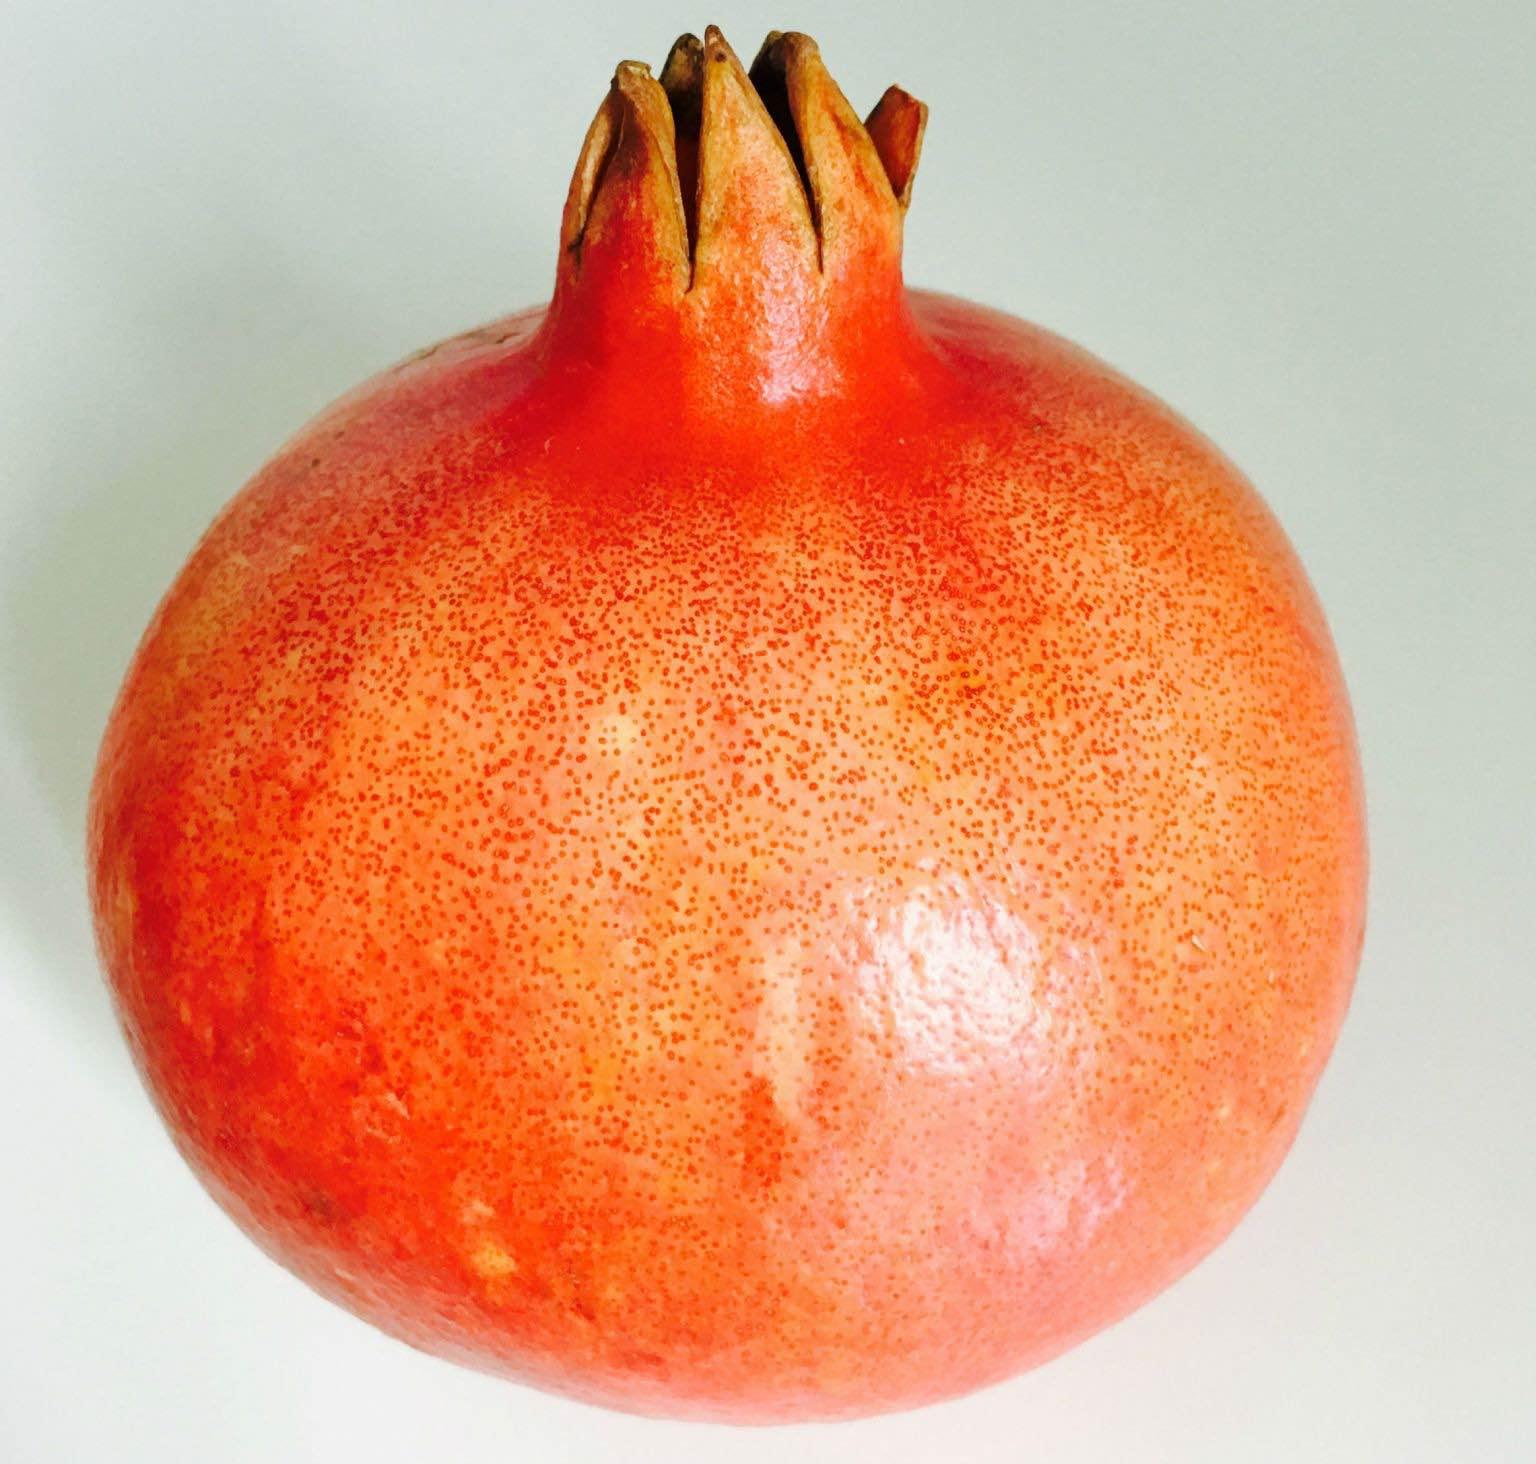 fha-granatapfel-fotor-text-0